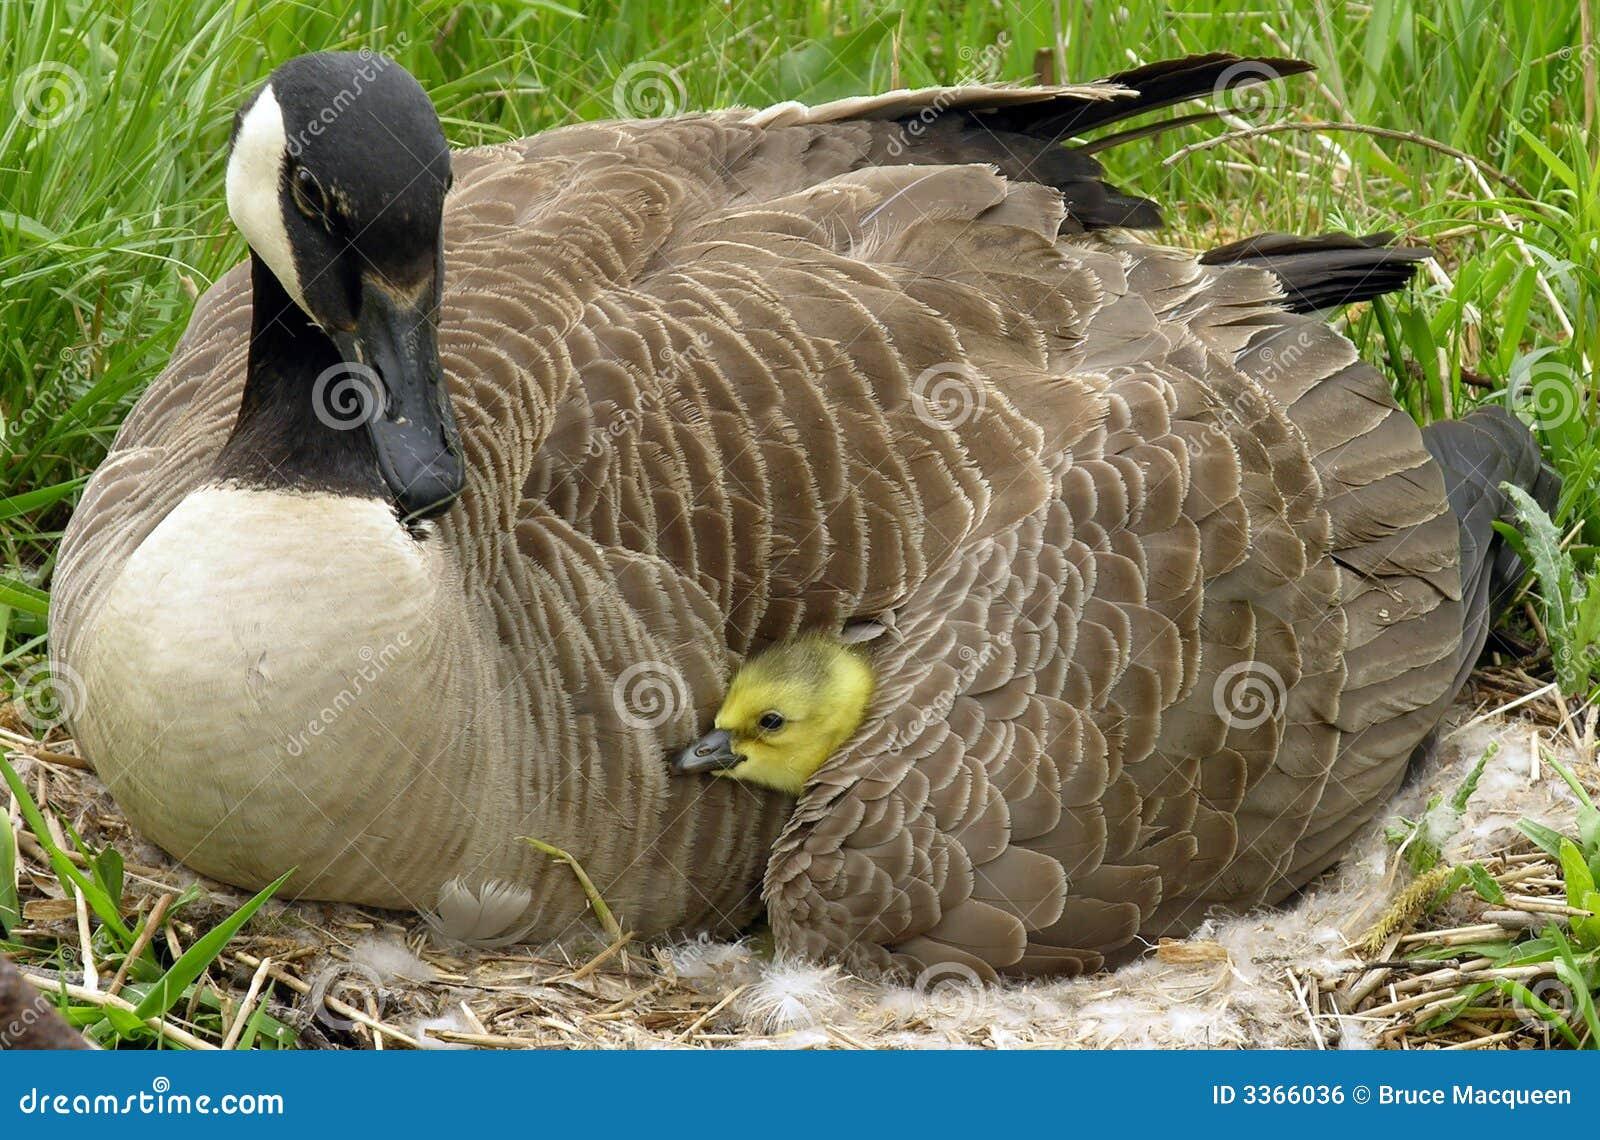 Canada Goose Royalty Free Stock Image - Image: 3366036